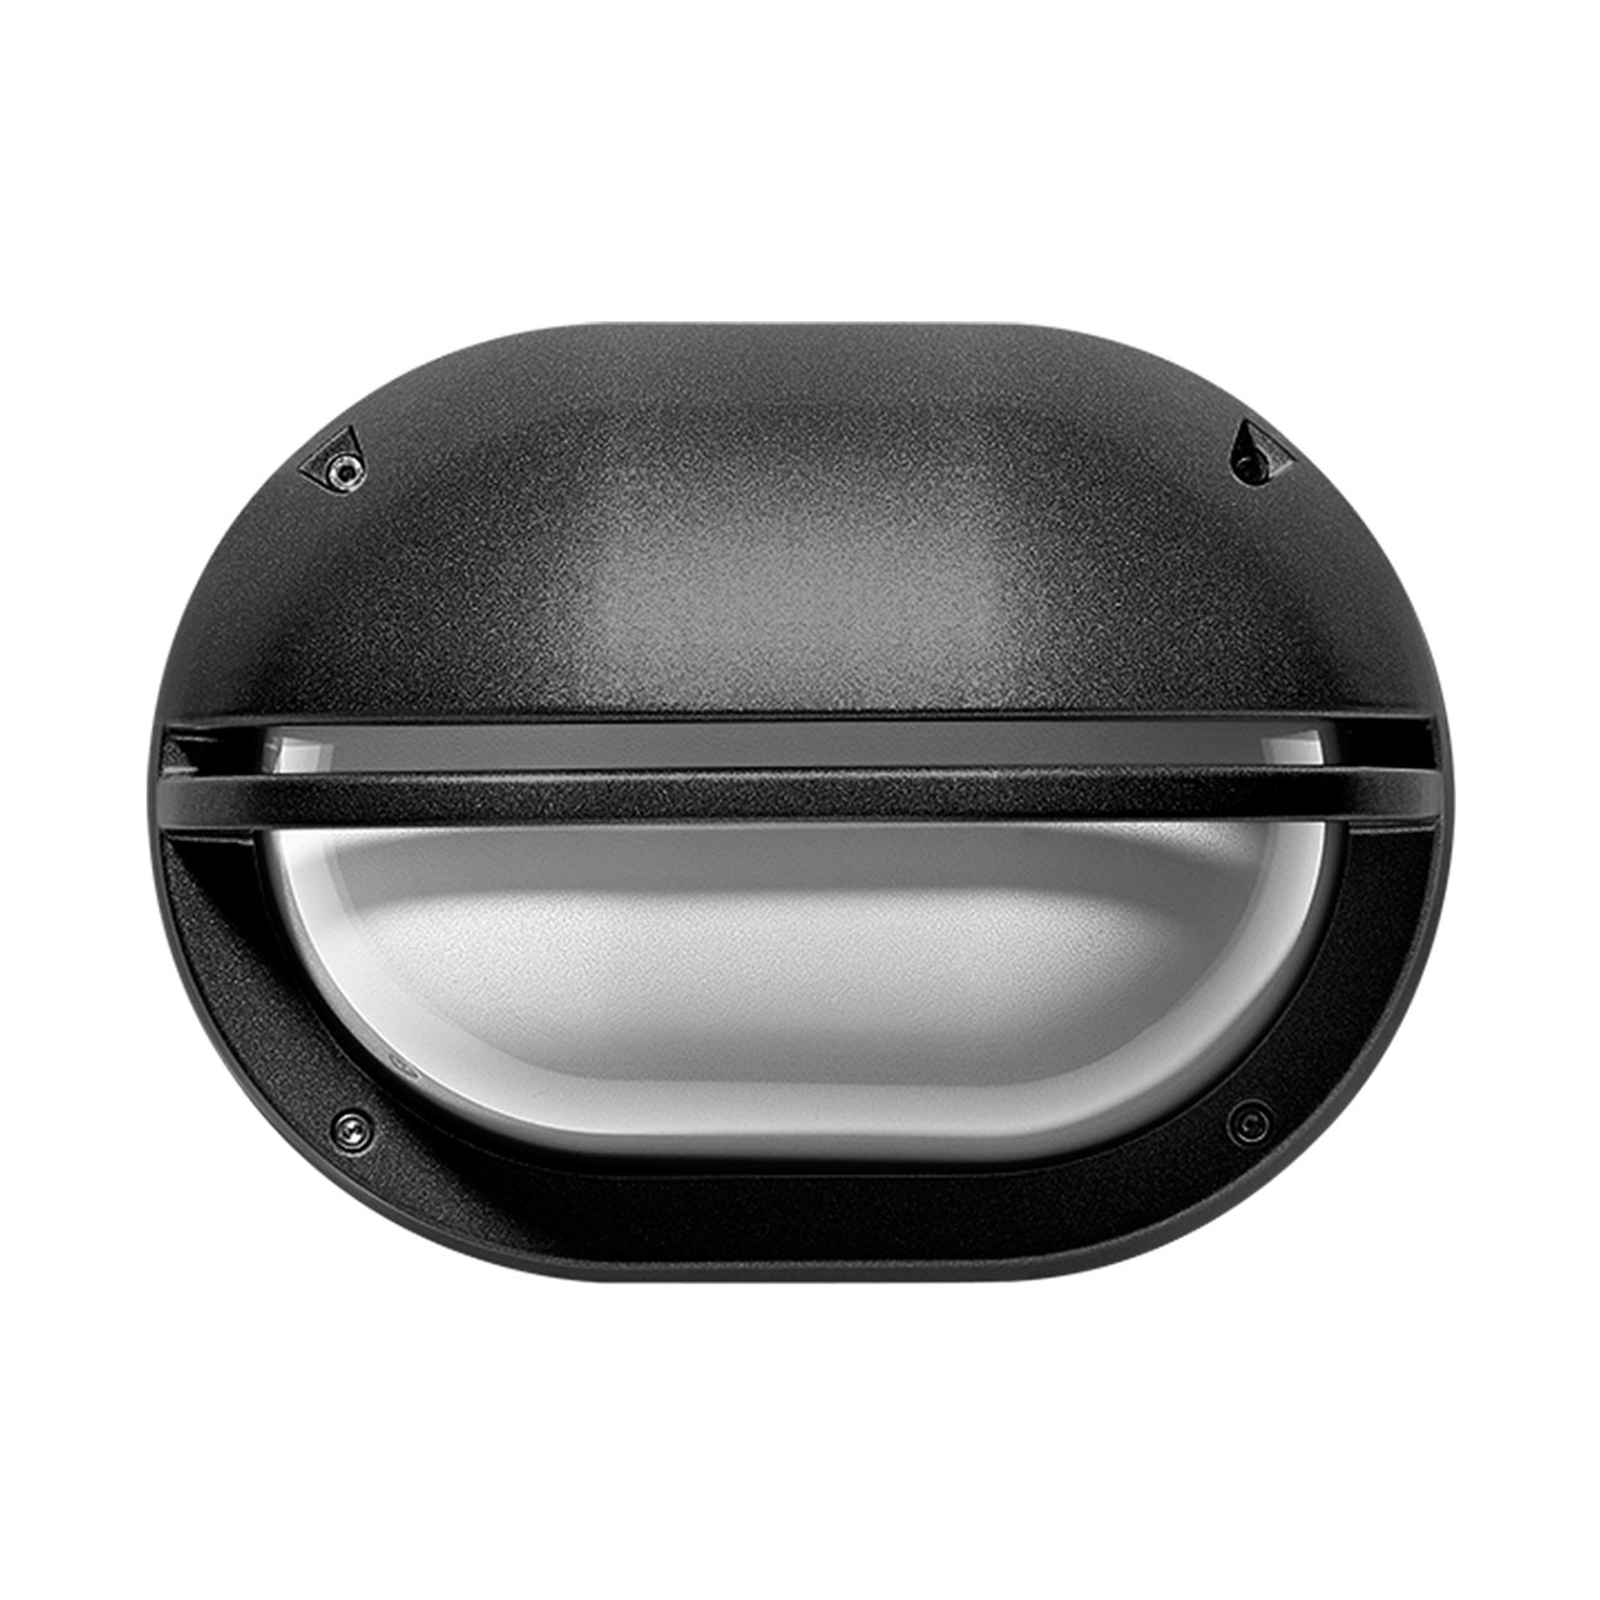 LED-Wandleuchte Eko+19 Grill anthrazit 3.000K